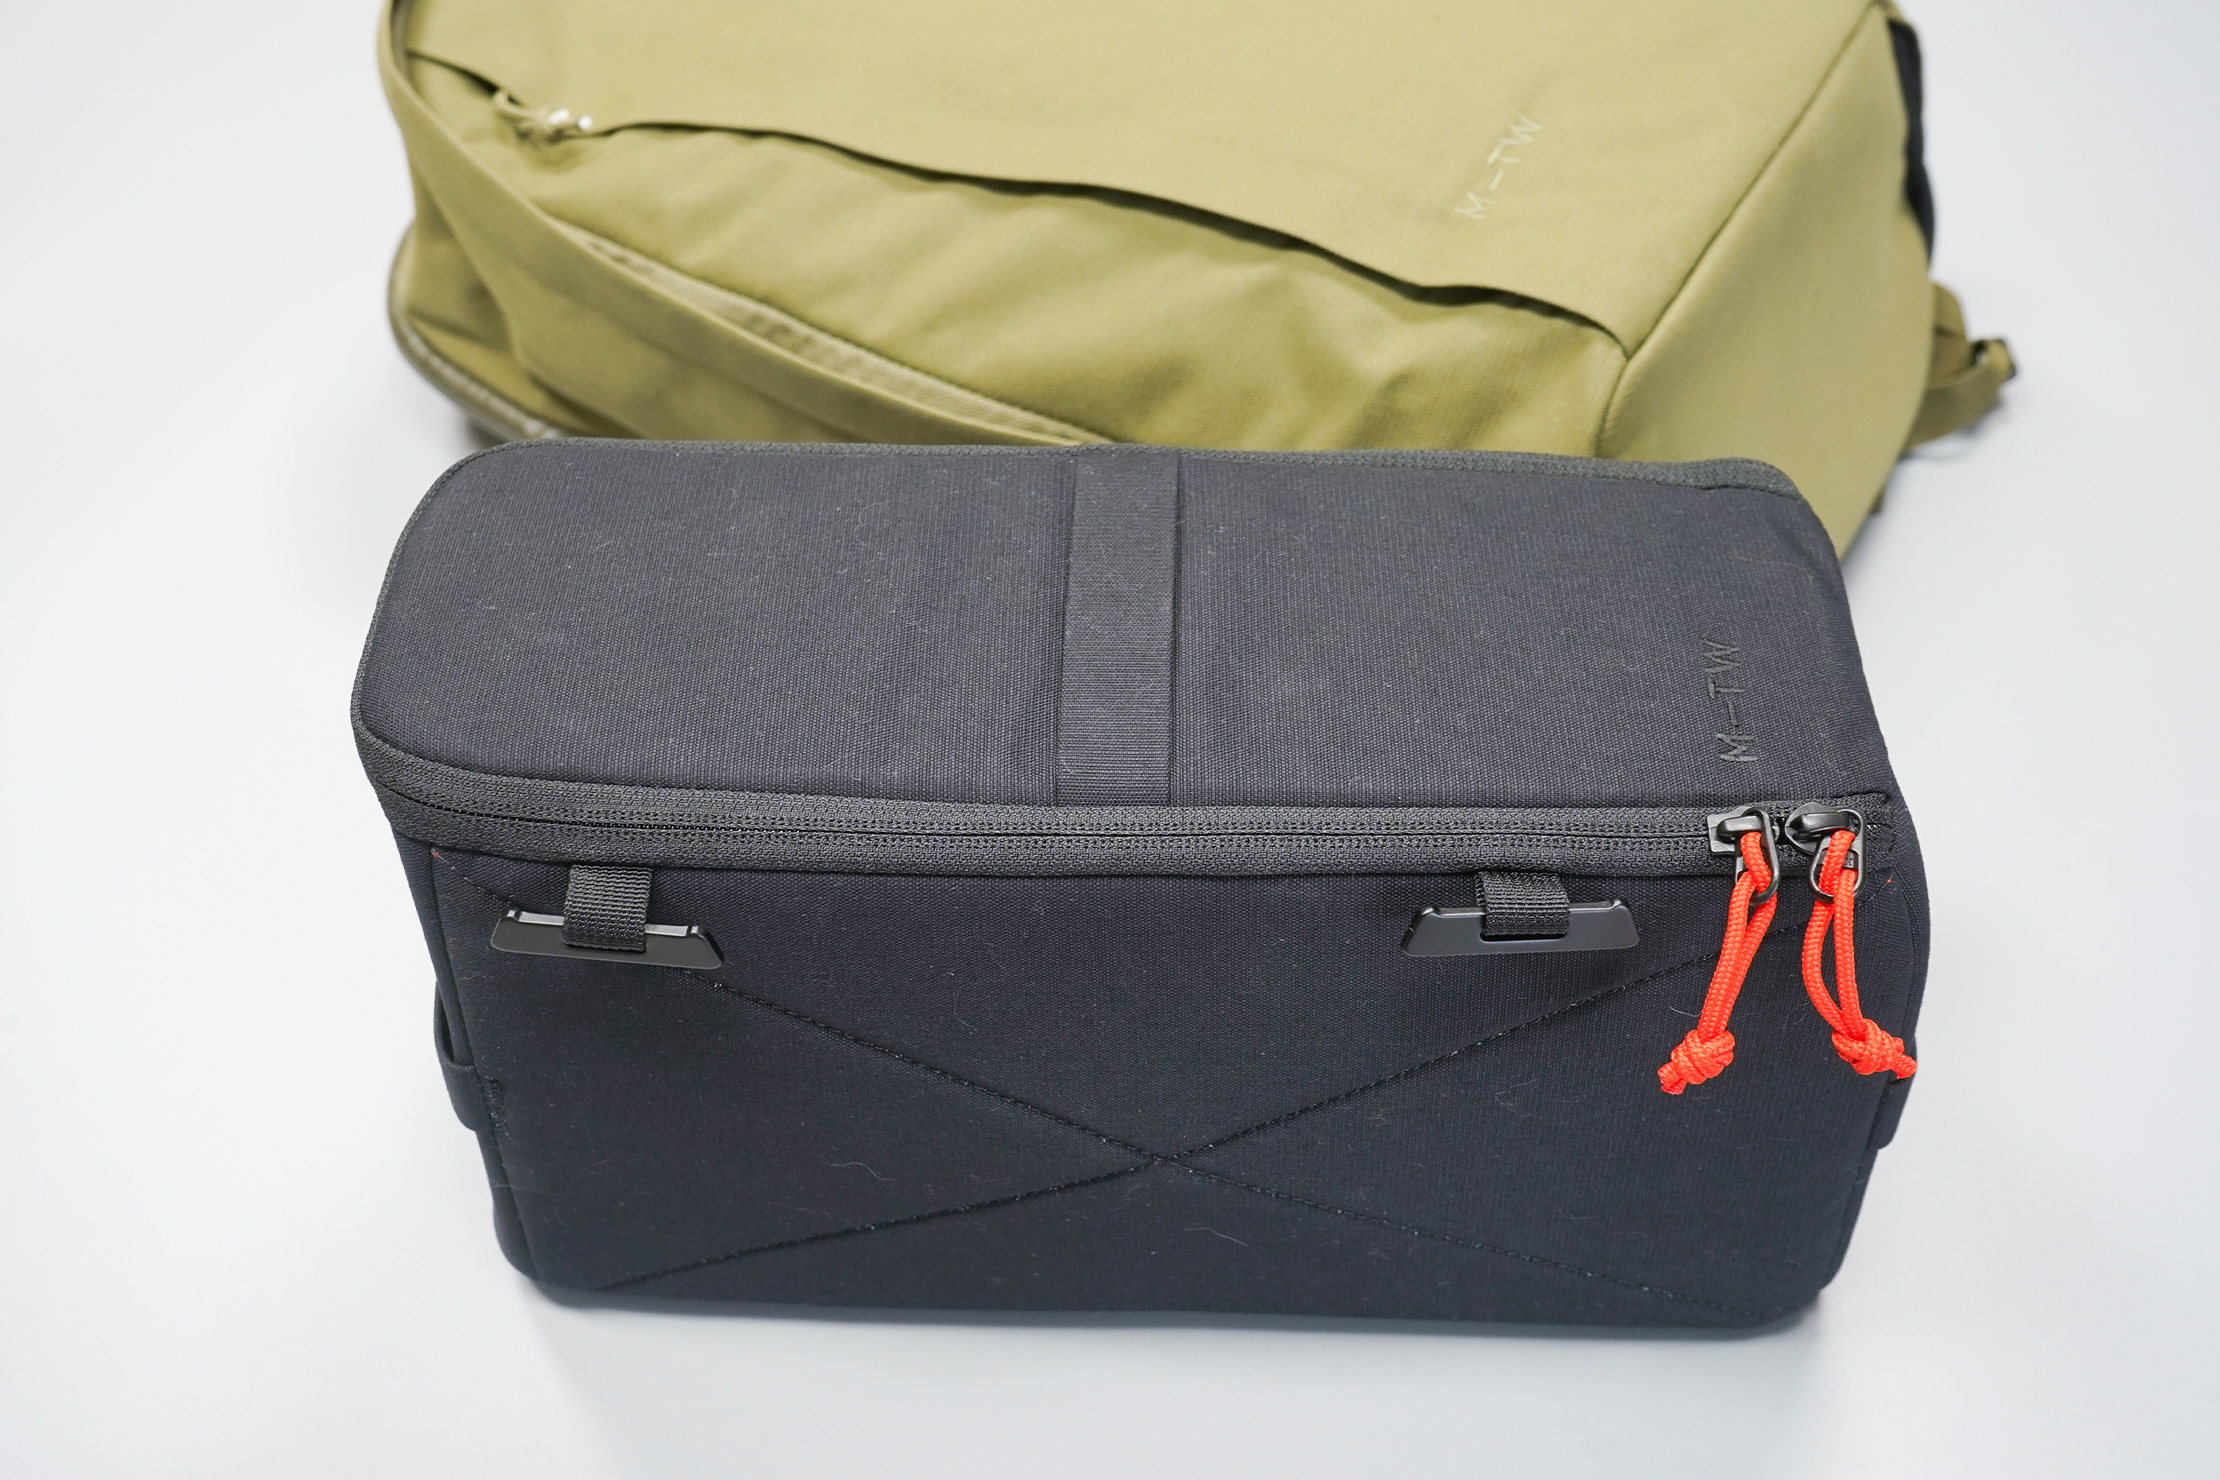 Moment MTW Camera Insert 5L | MTW Backpack 21L and Camera Insert 5L